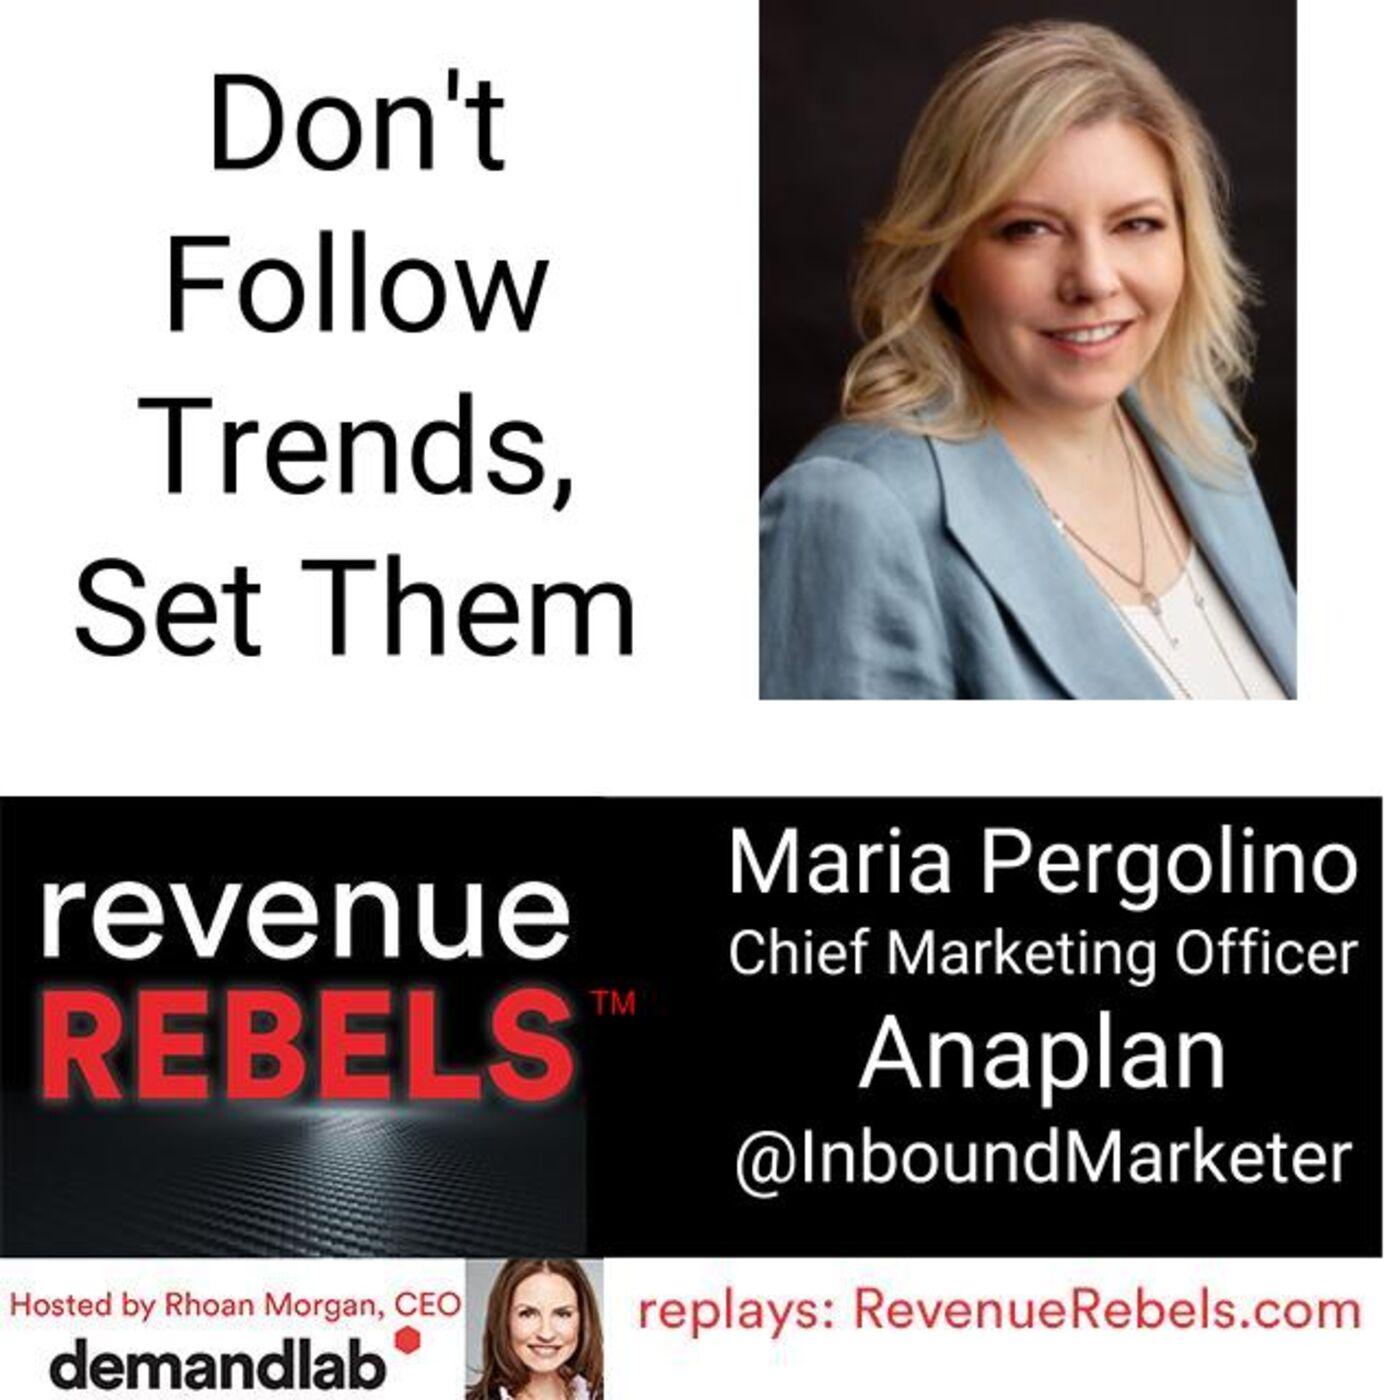 Don't Follow Trends, Set Them